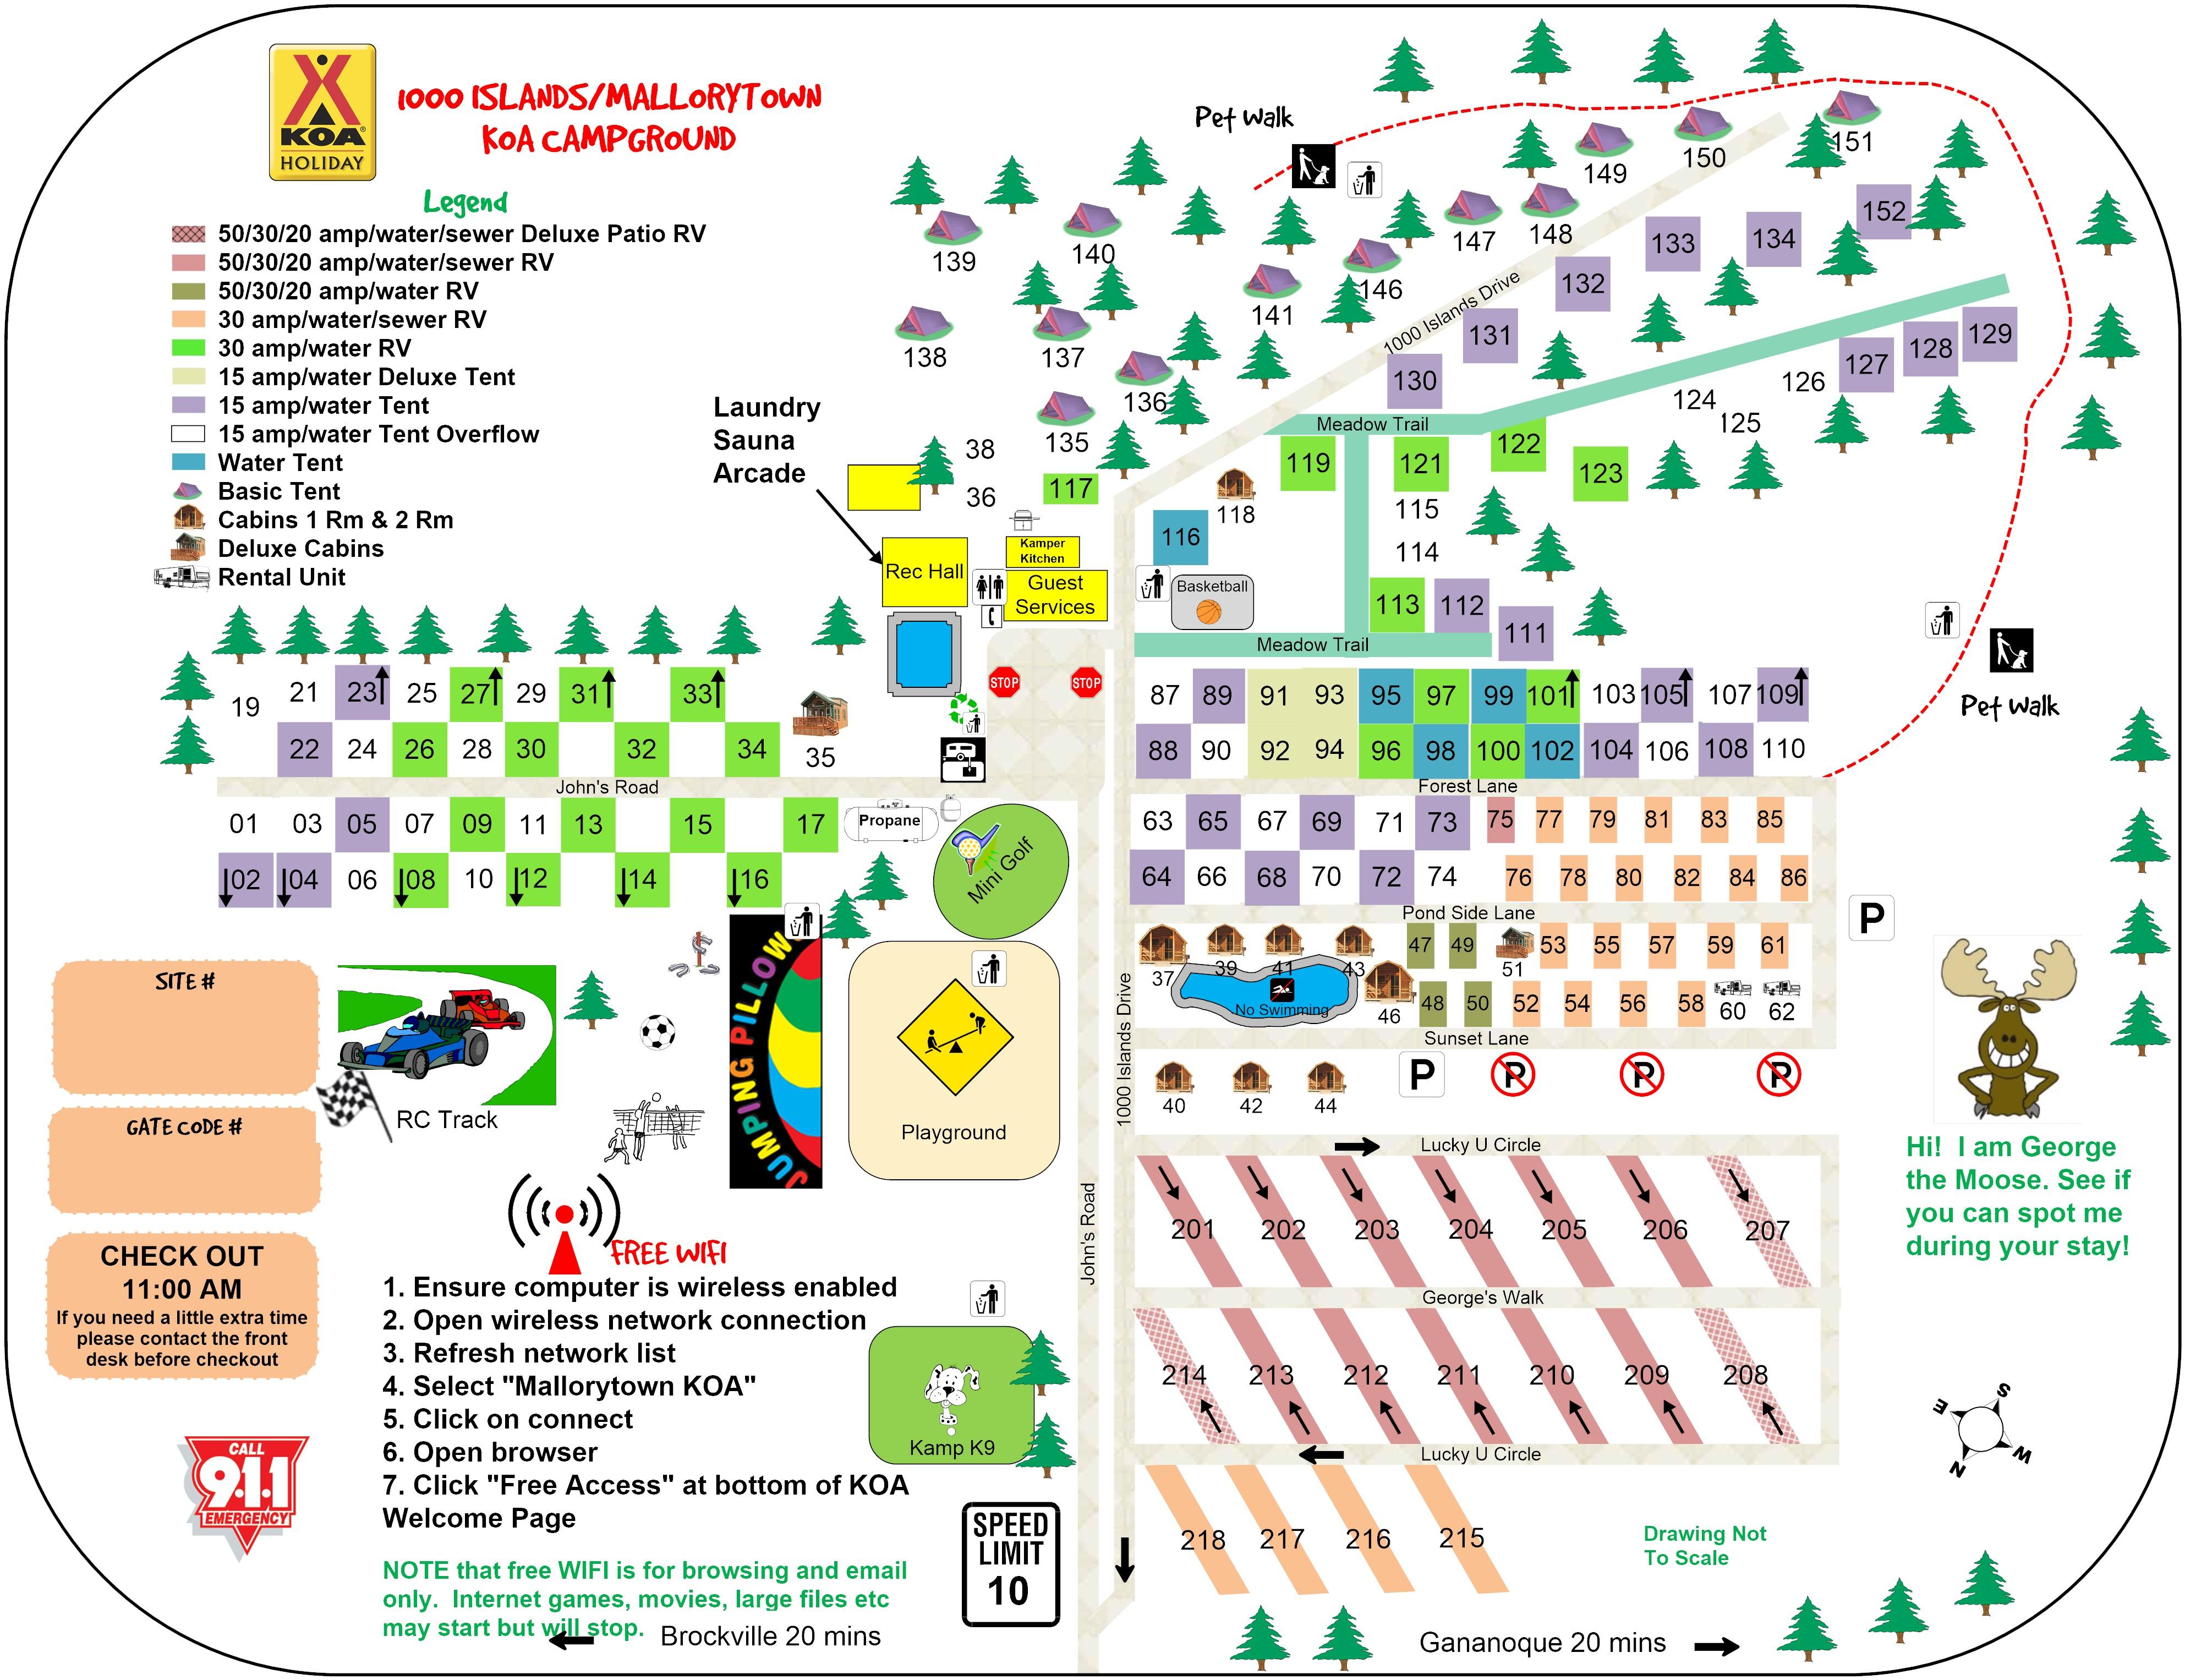 Mallorytown, Ontario Campground | 1000 Islands / Mallorytown KOA on koa corporate headquarters, petaluma ca map, manchester koa map, koa directory map, san diego map, betabel rv park campsite map, fort bragg ca map, koa mariposa ca, koa jones, koa lexington kentucky, redwood campgrounds map, tower park koa map, ca campgrounds map, koa store, koa frederick md, koa williamsport, koa middleville ny, koa tx, koa ridge prices, koa taos nm,